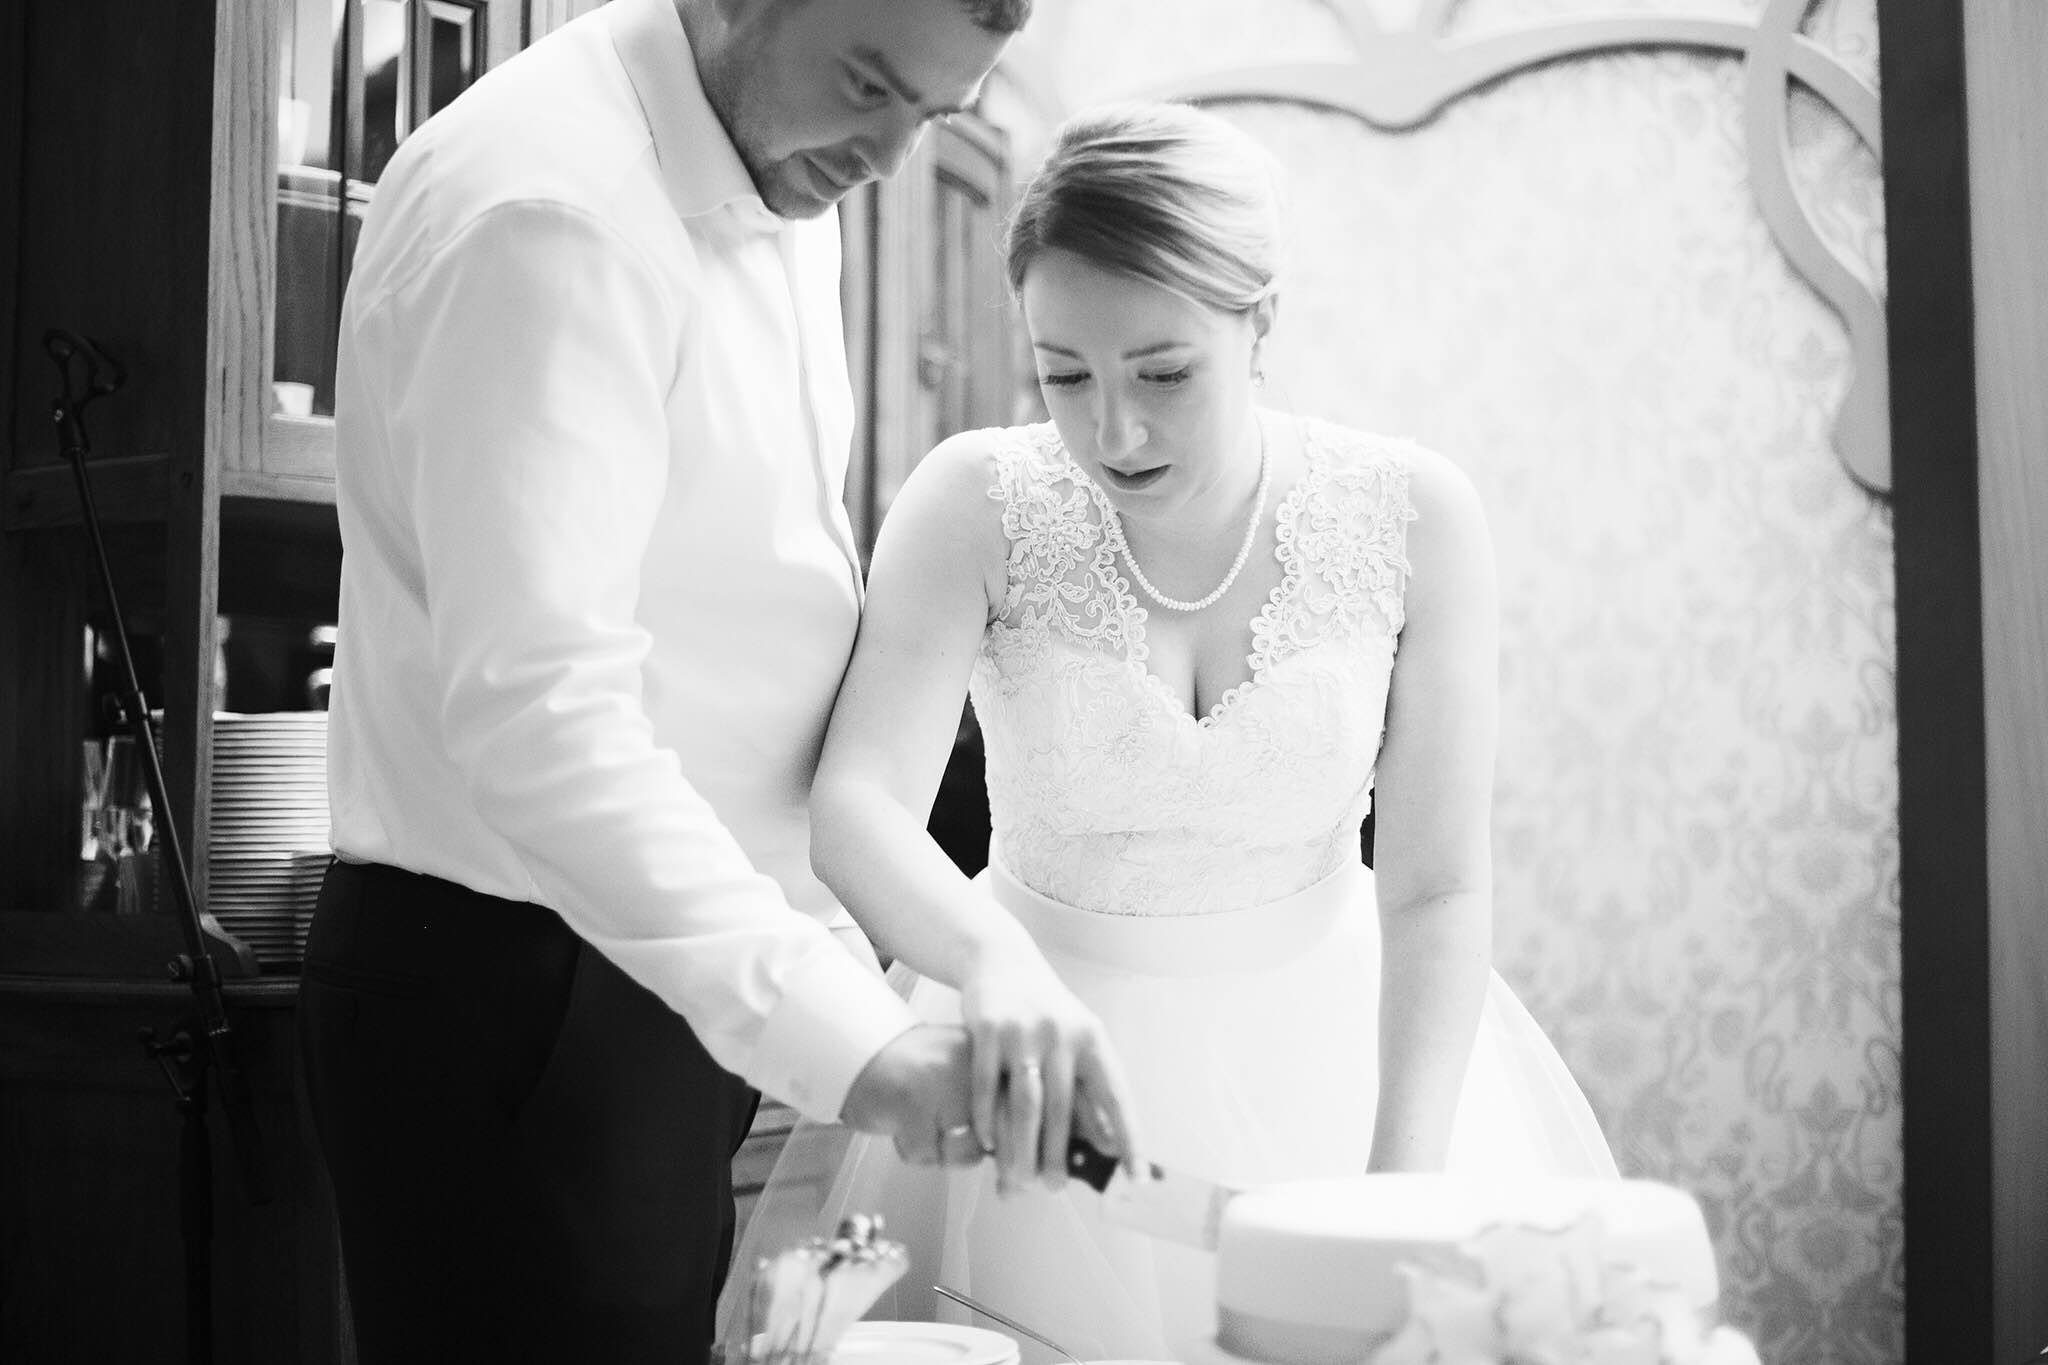 Betina ja Grigorij lõikavad pulmatorti Scheeli Restoranis. Foto autor: Polly Homjakina